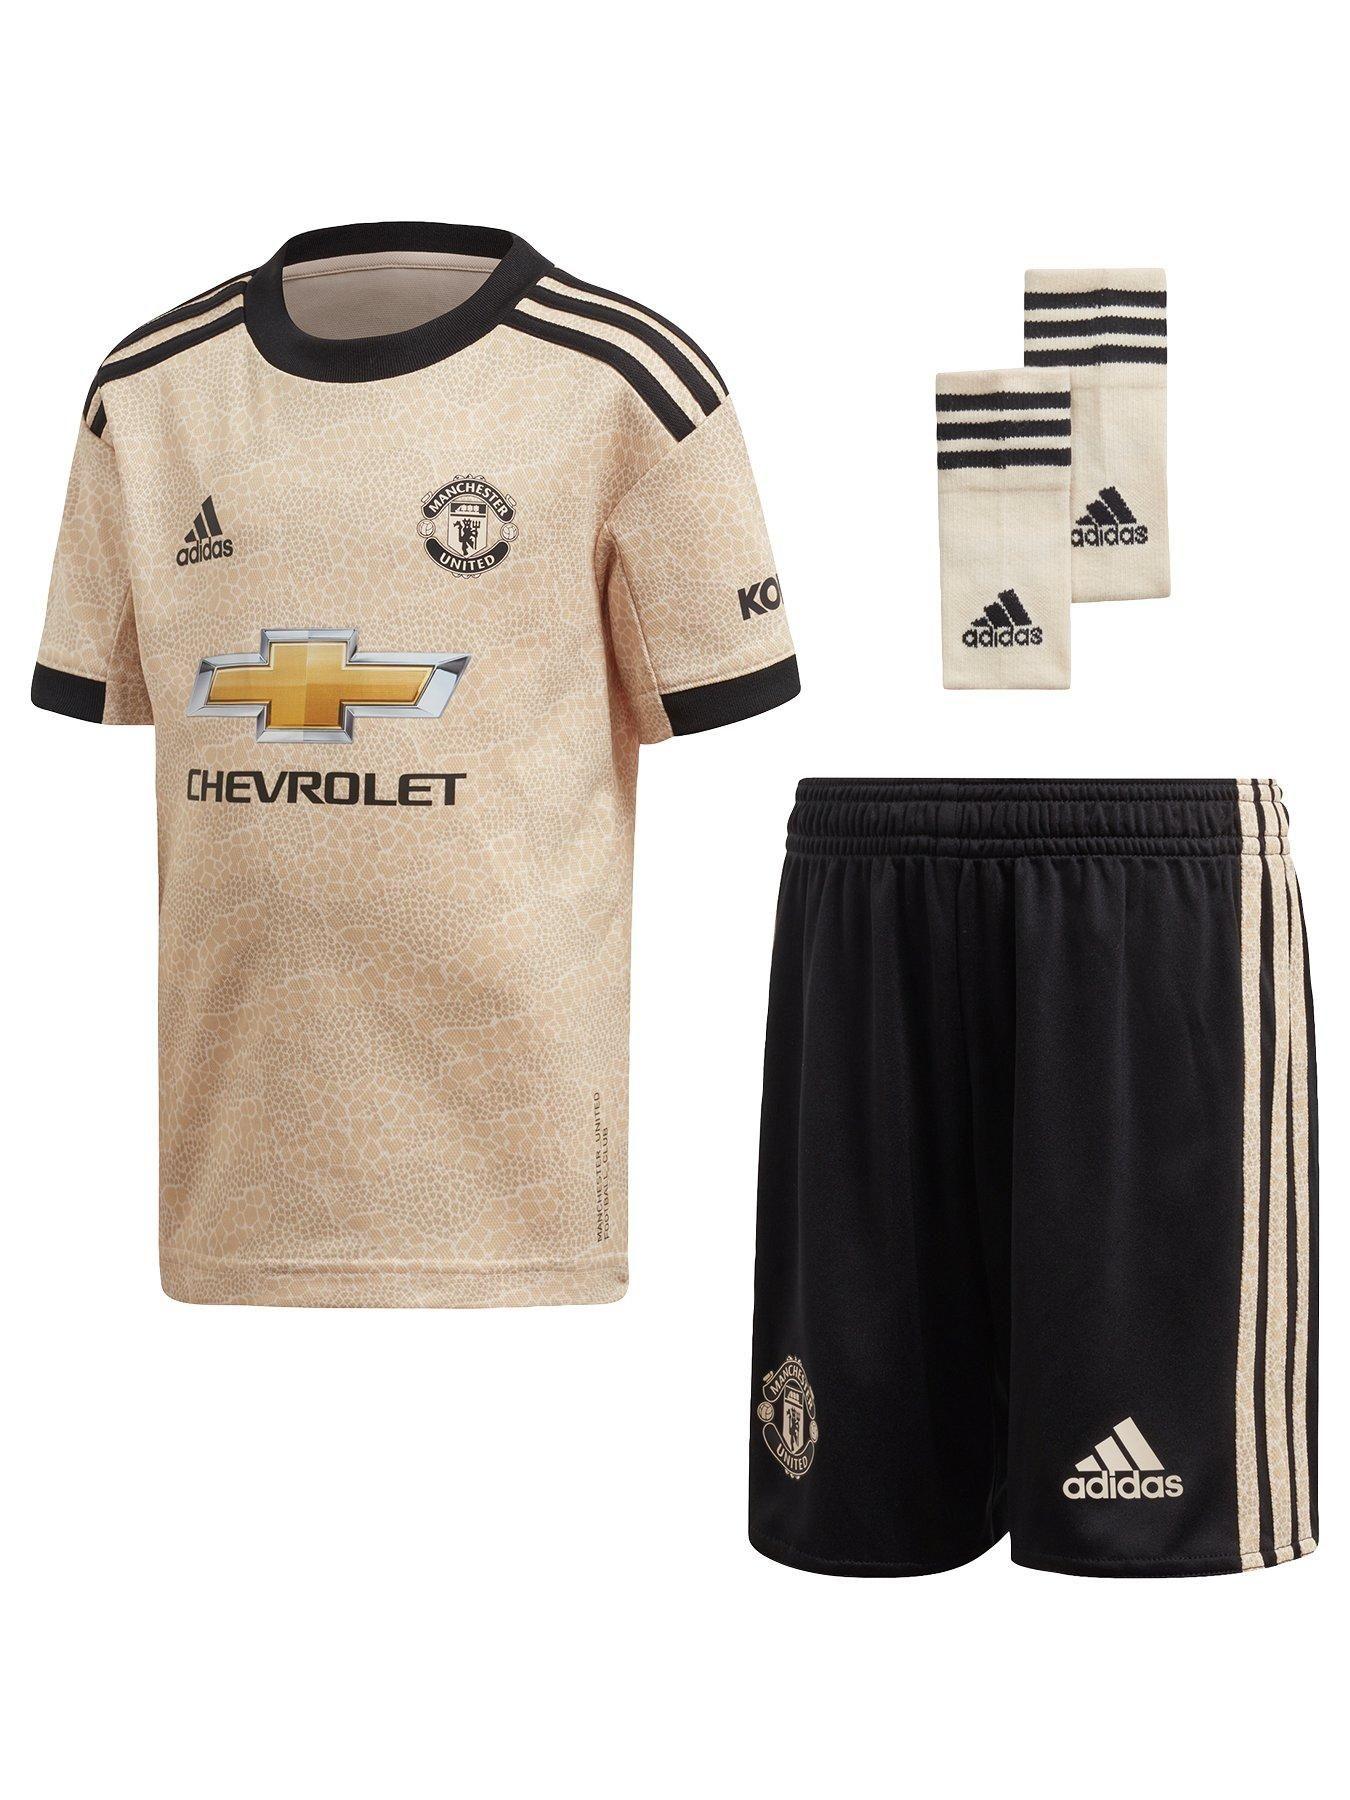 Manchester United Adidas Originals t shirt S BNWT, Men's